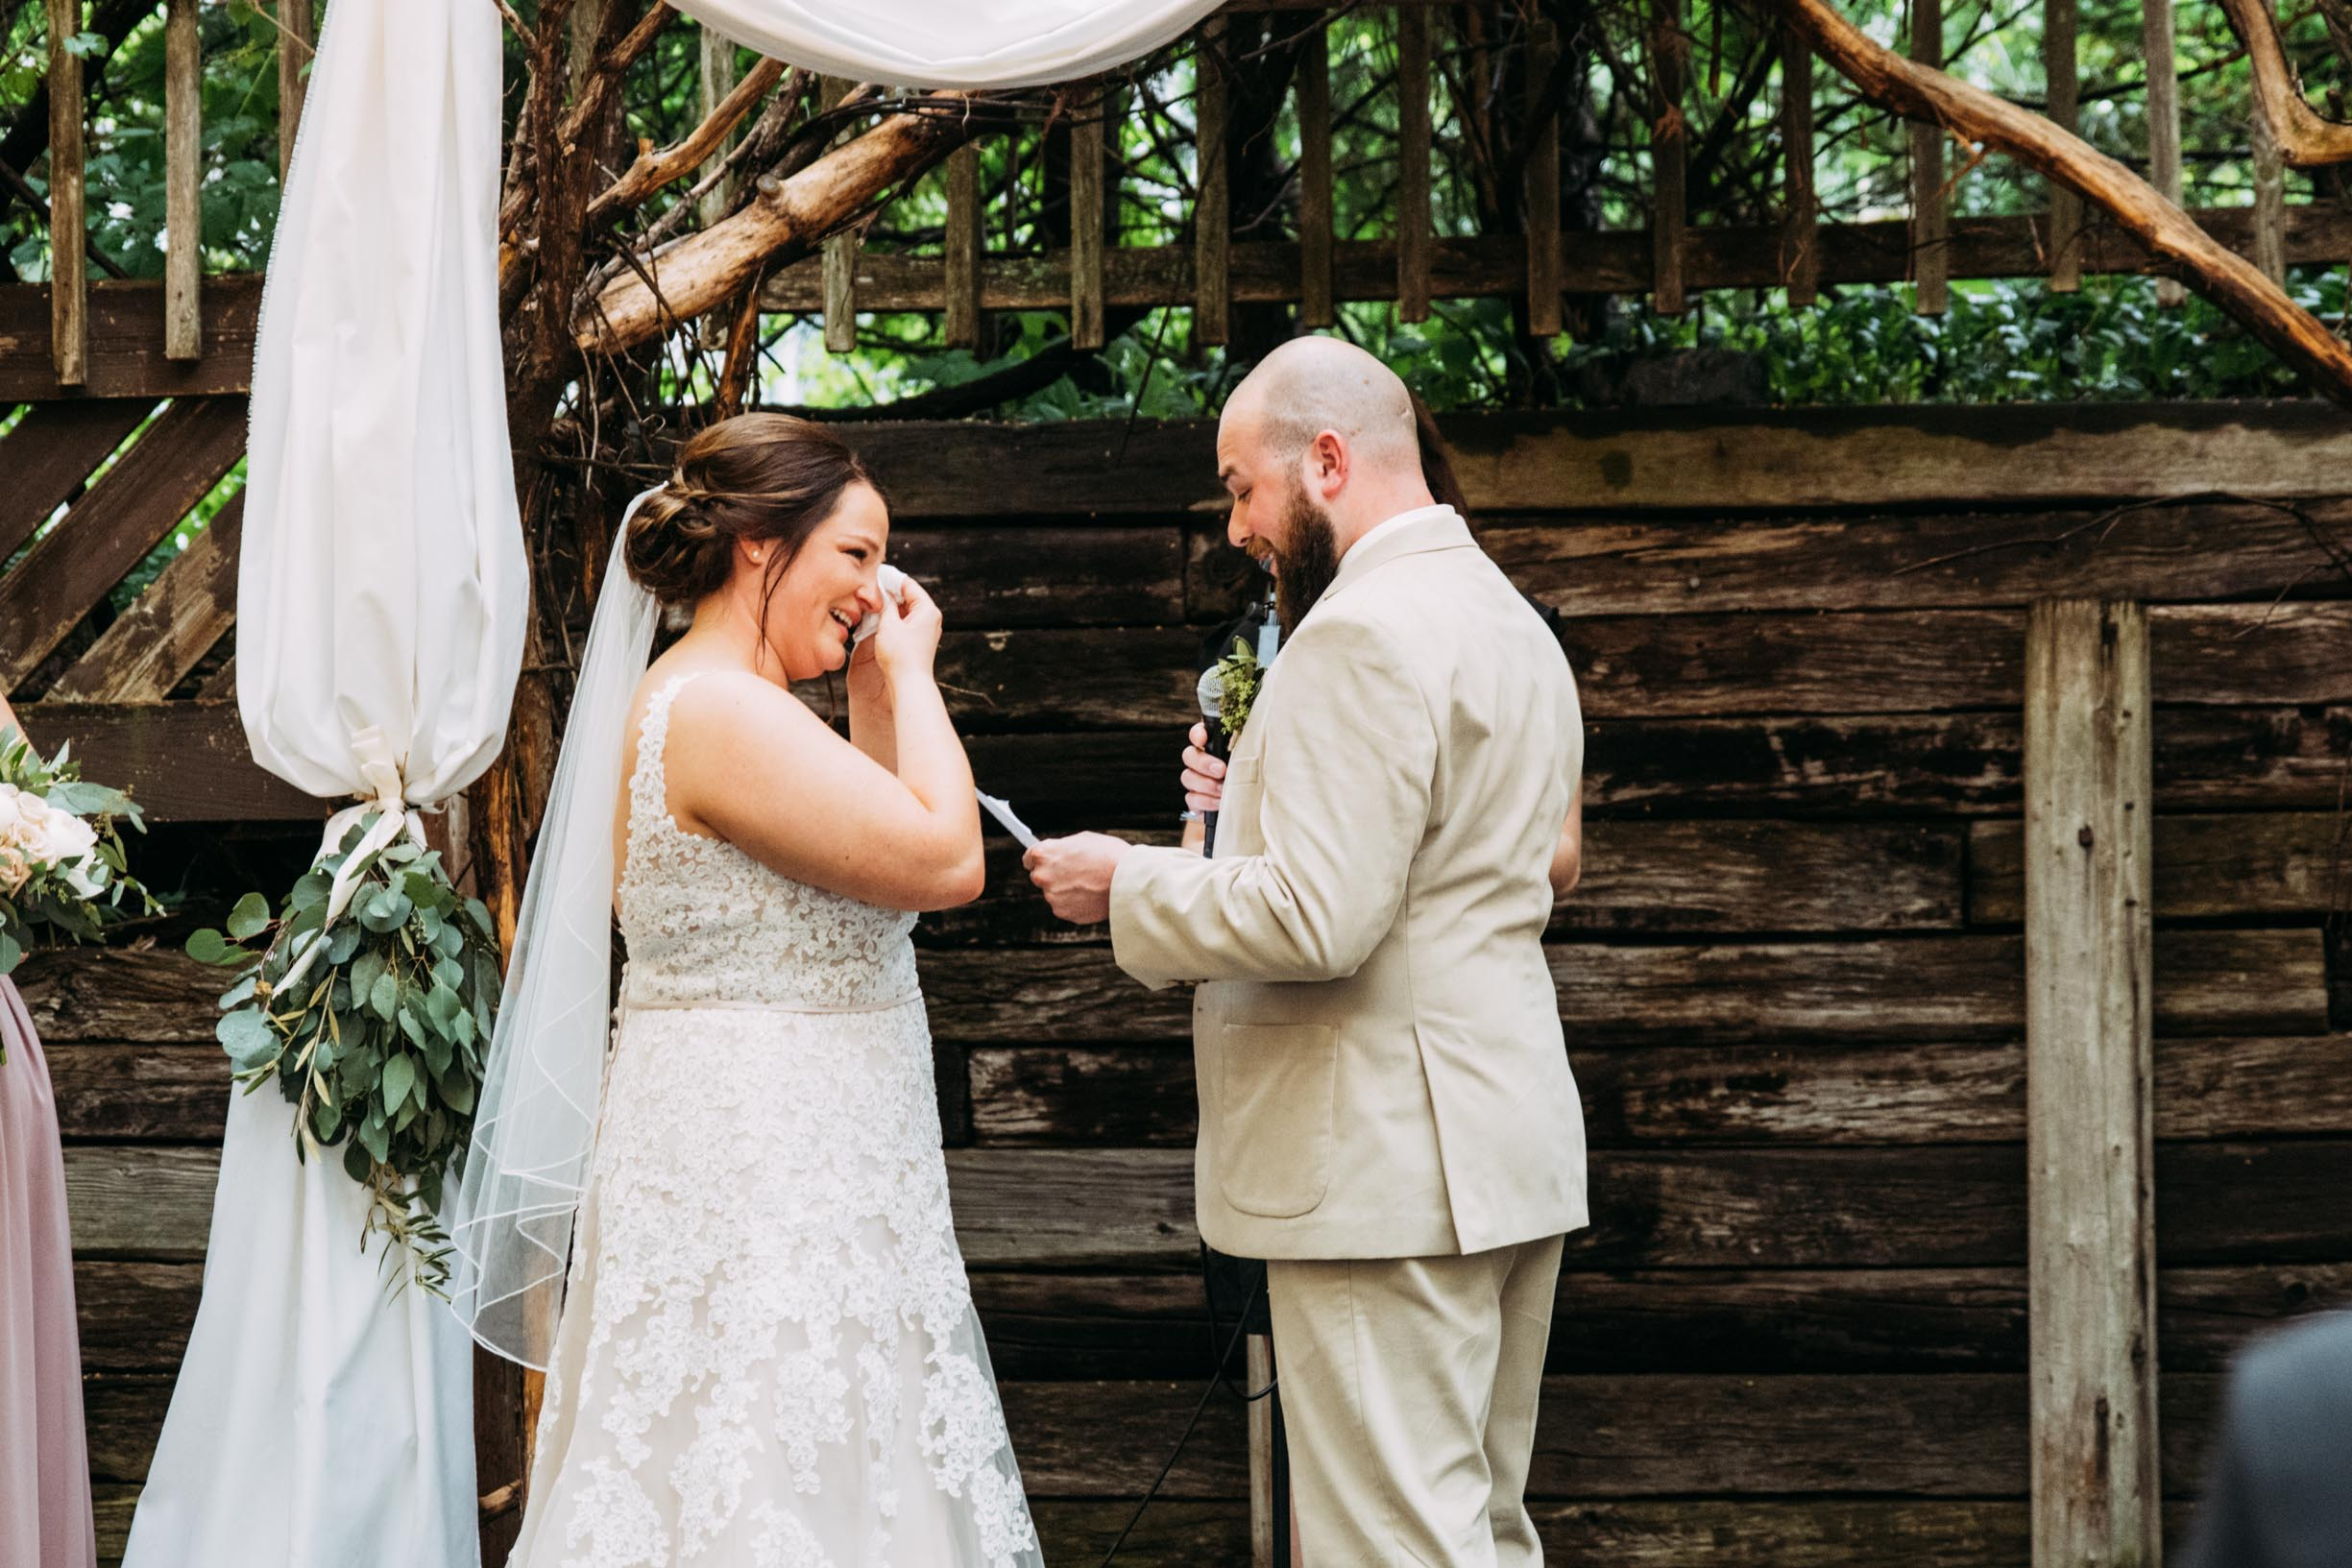 46-Jess_Jeremy_Minnesota_Wedding_Ceremony.jpg